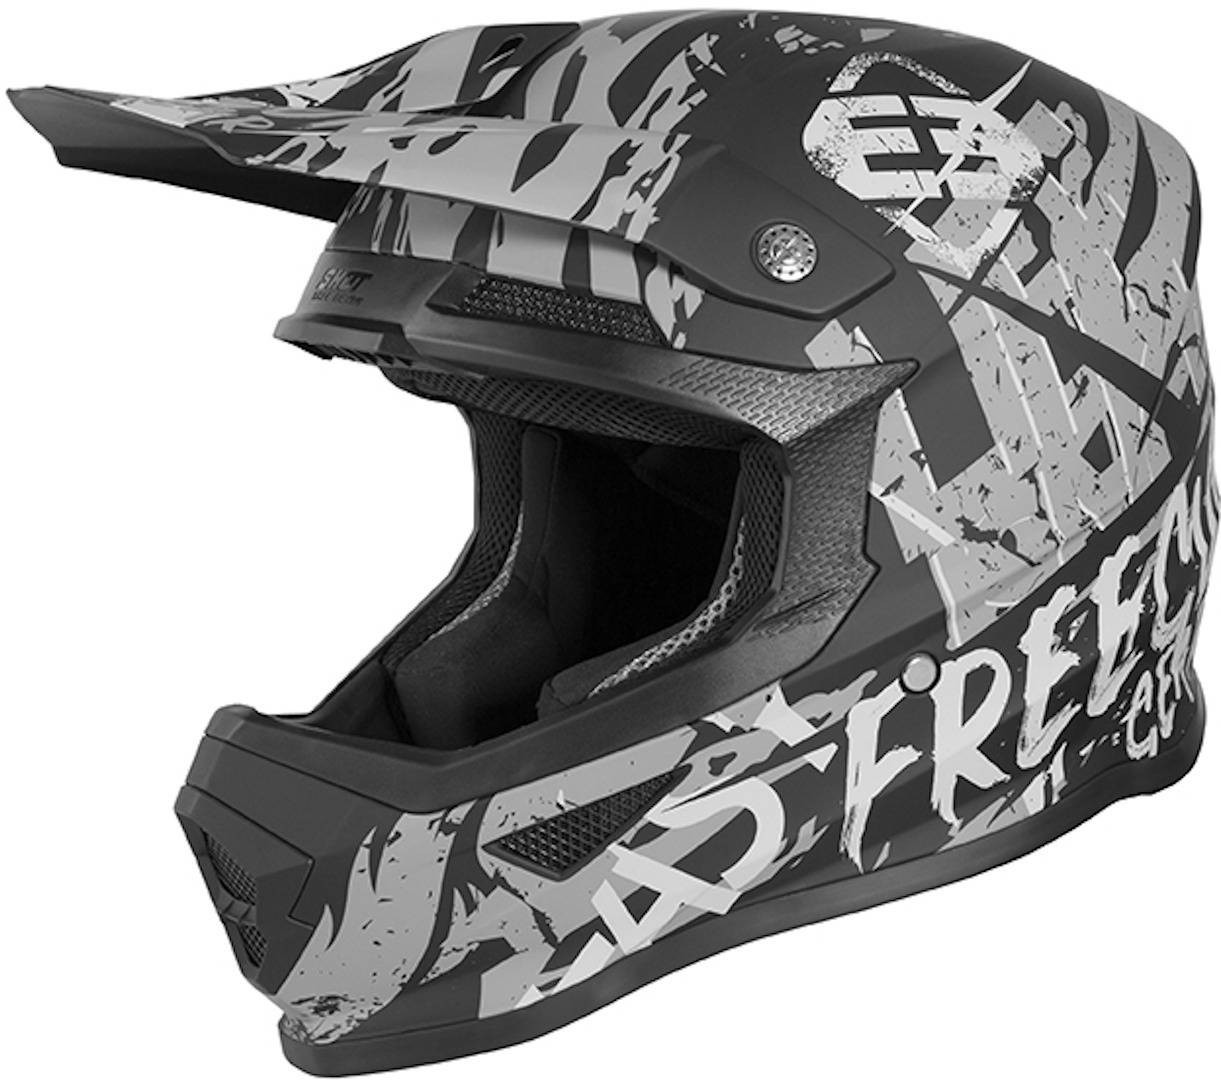 Freegun XP4 Maniac Barn motocross hjelm M Svart Grå